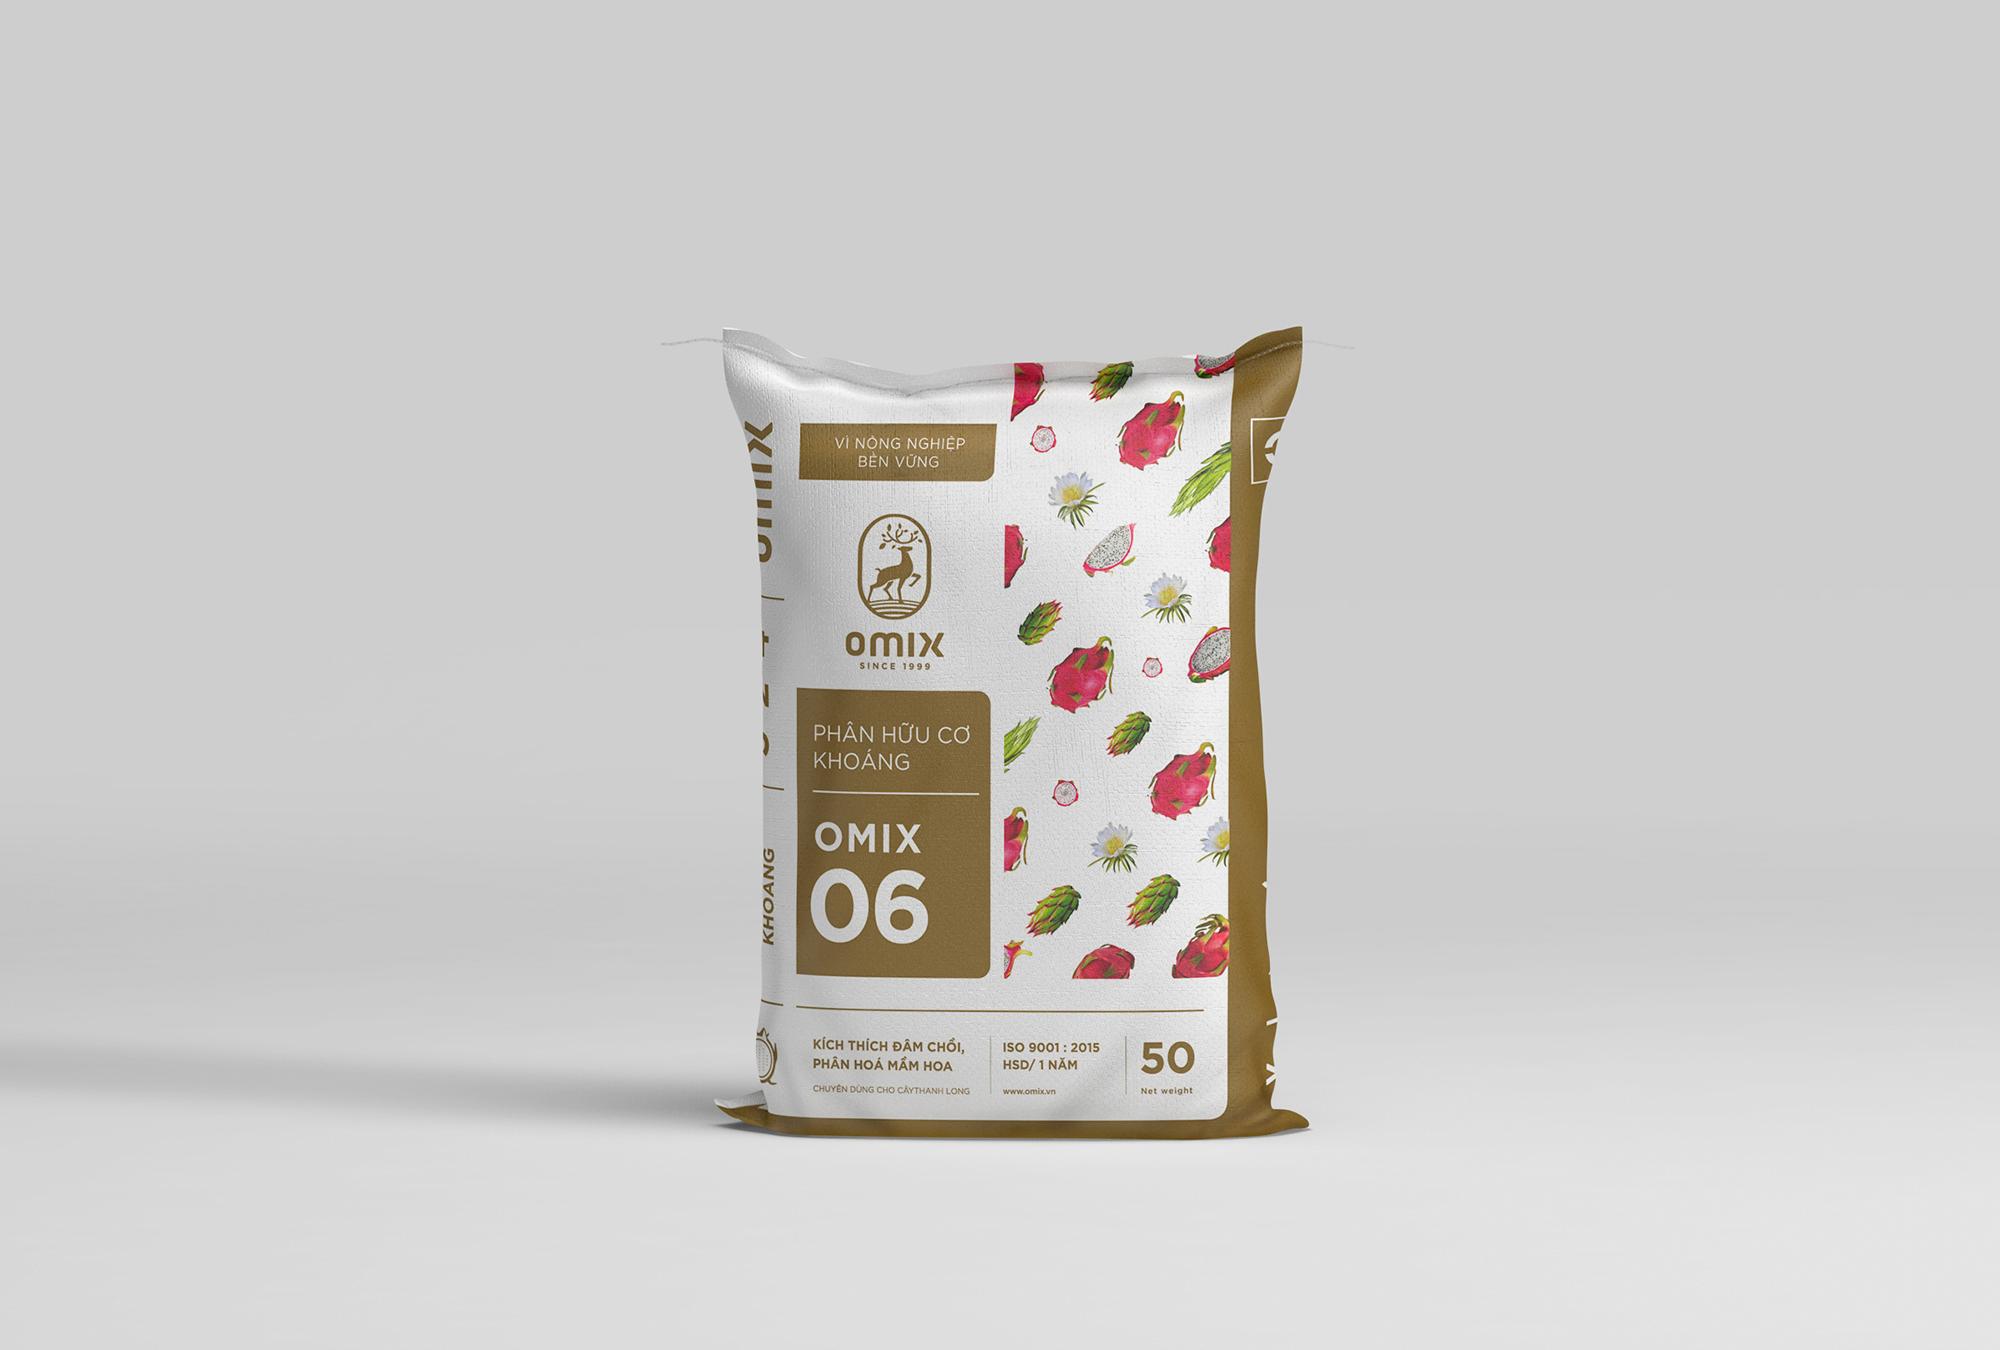 rgb_creative_ideas_design_packaging_bratus_omix_06